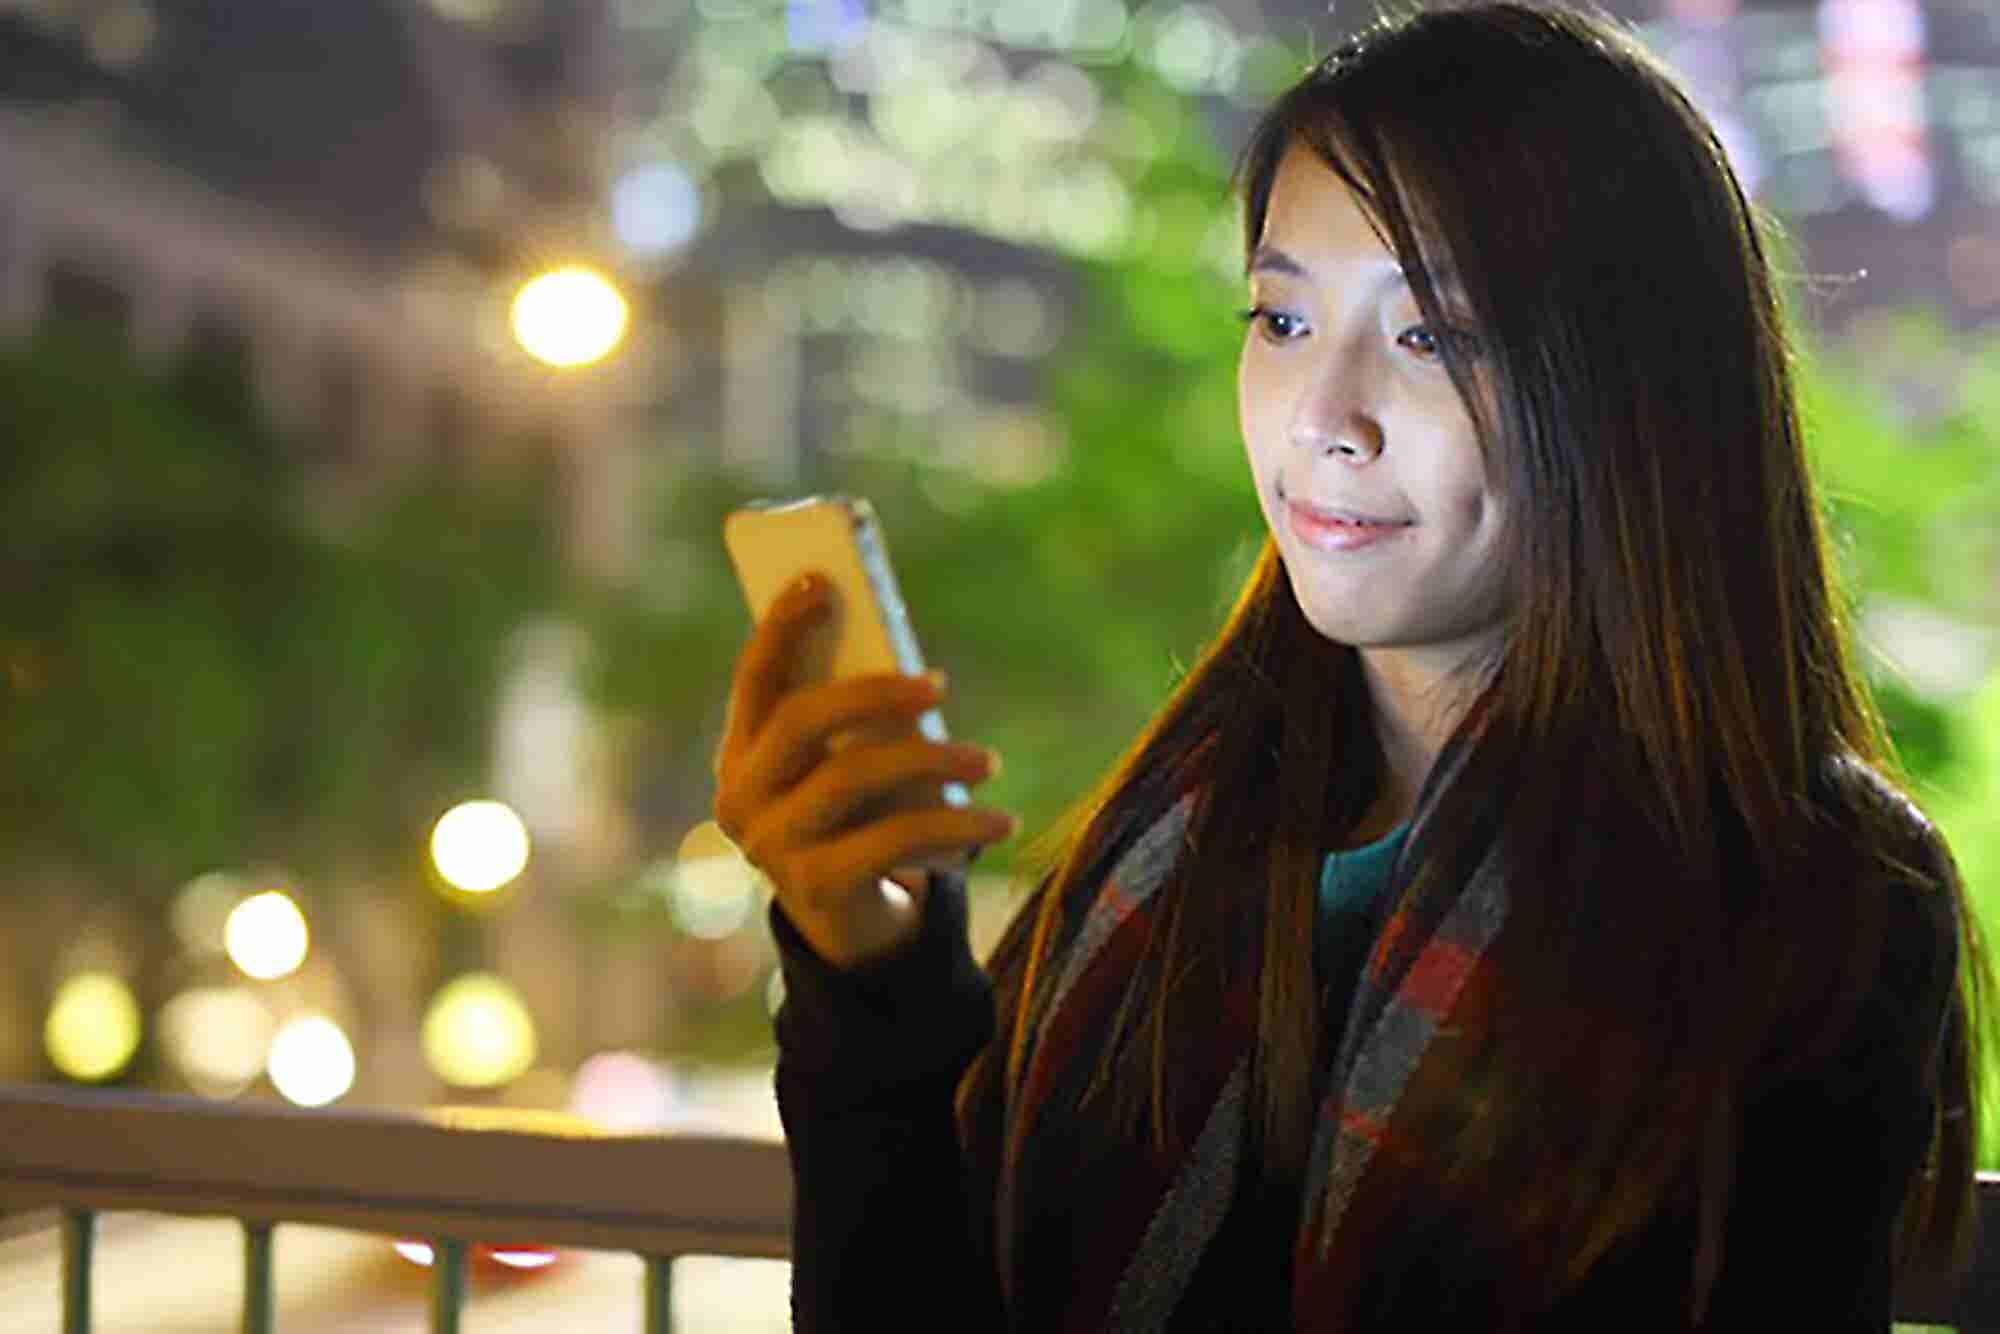 5 Ways to Maximize Mobile Advertising ROI Ahead of Holiday Season